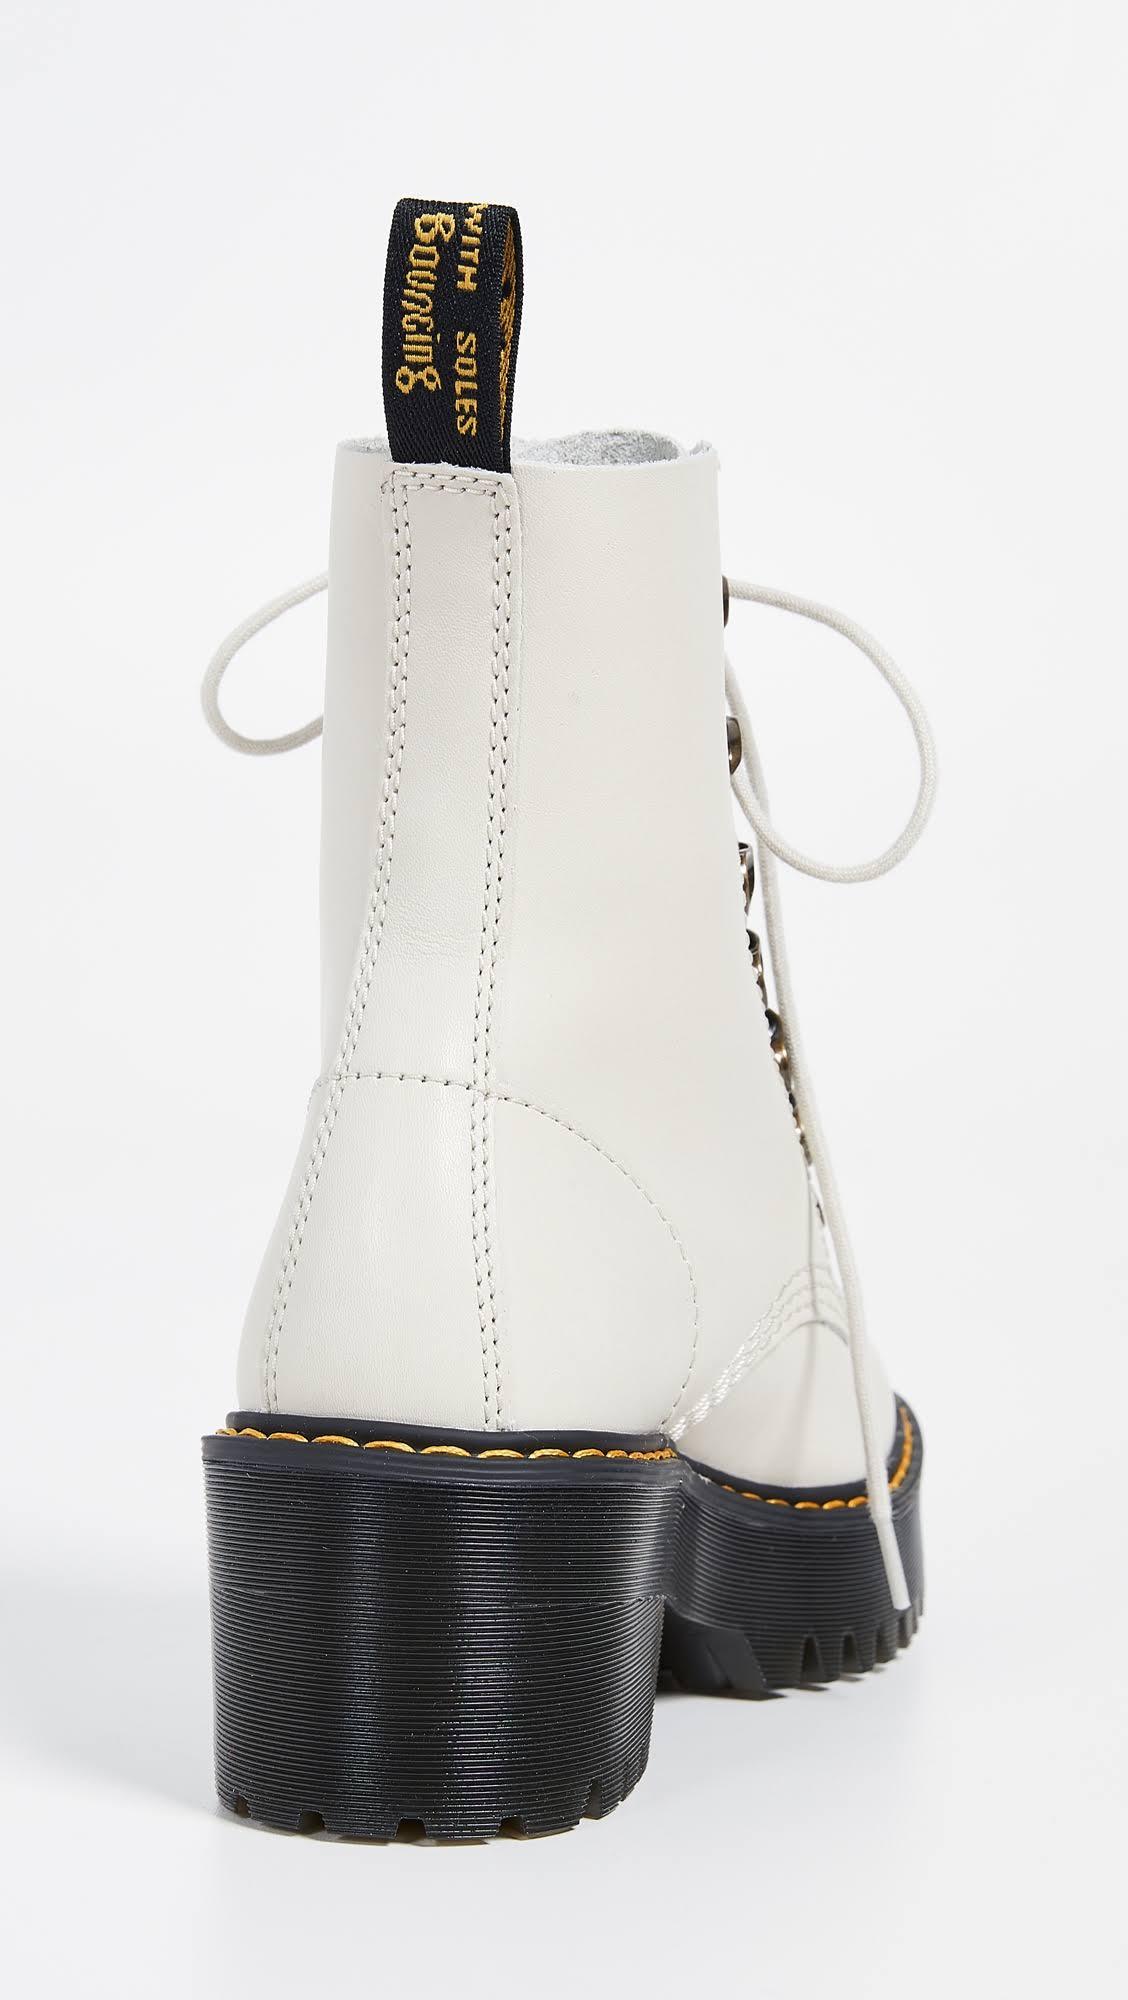 Leona DrMartens 7 Hook 10 Bone Boots qSUGzMpV